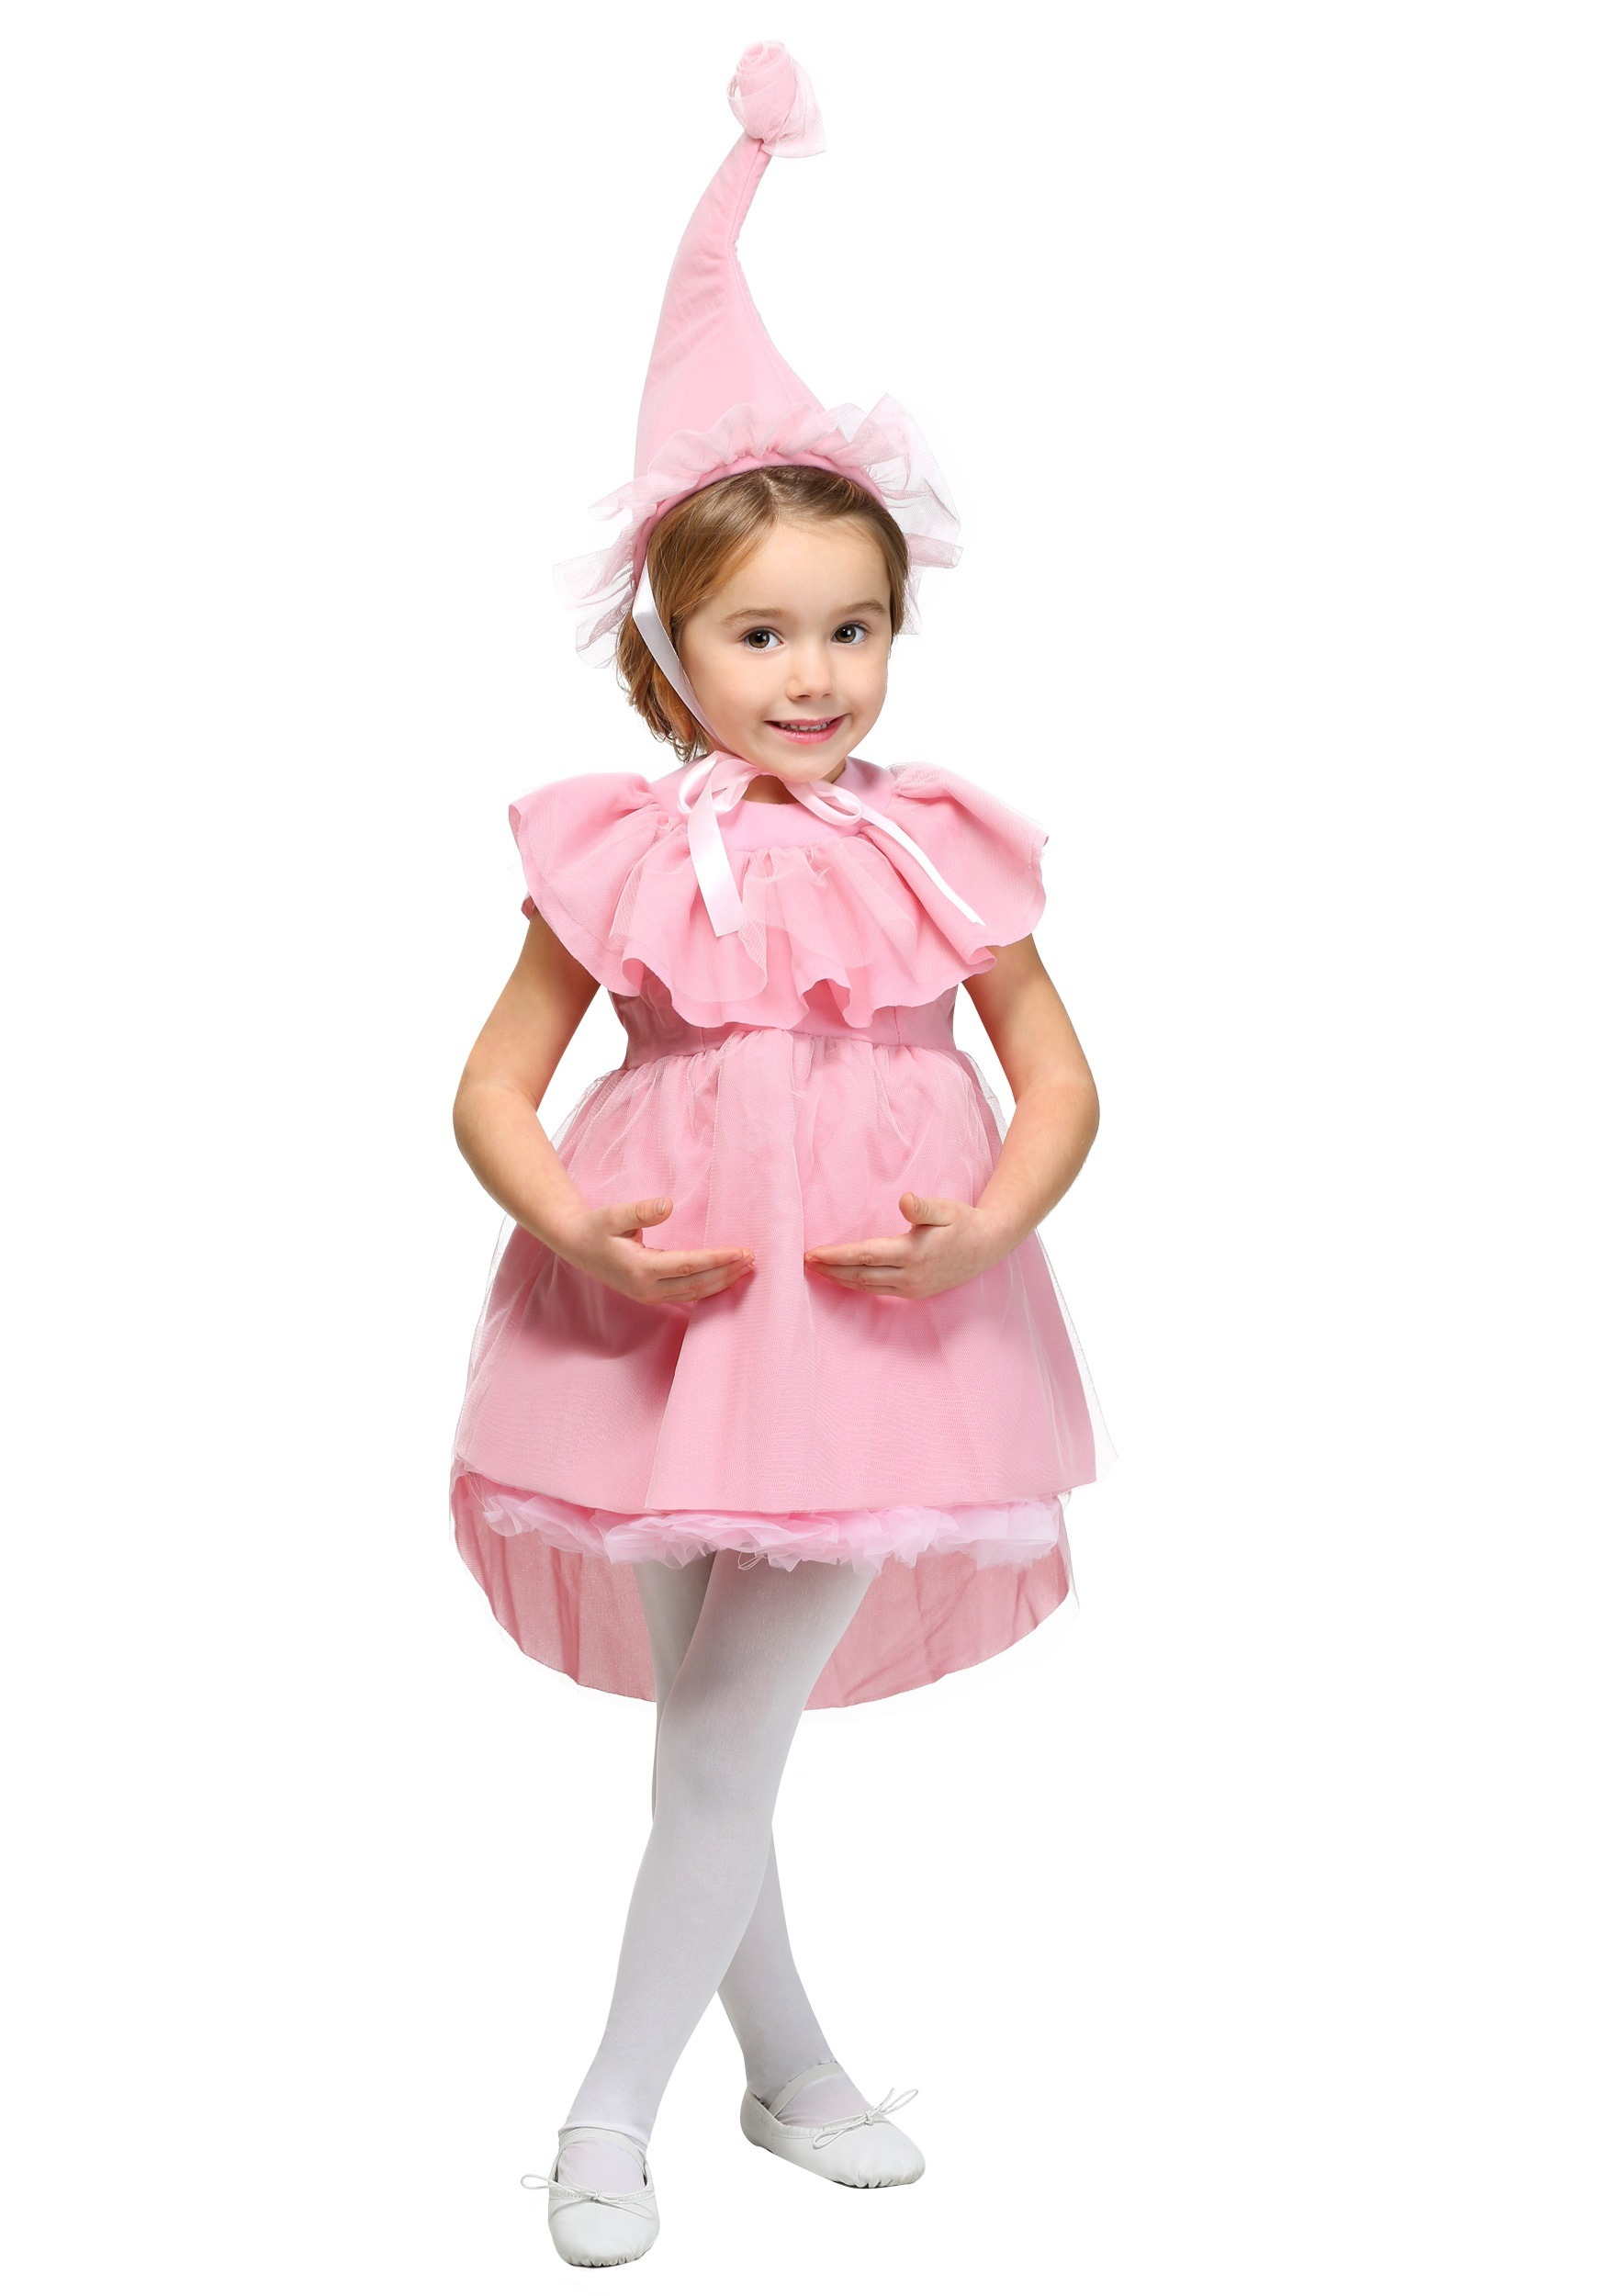 ea66d62f1213 Ballet Dancer Costumes - Ballerina Costumes